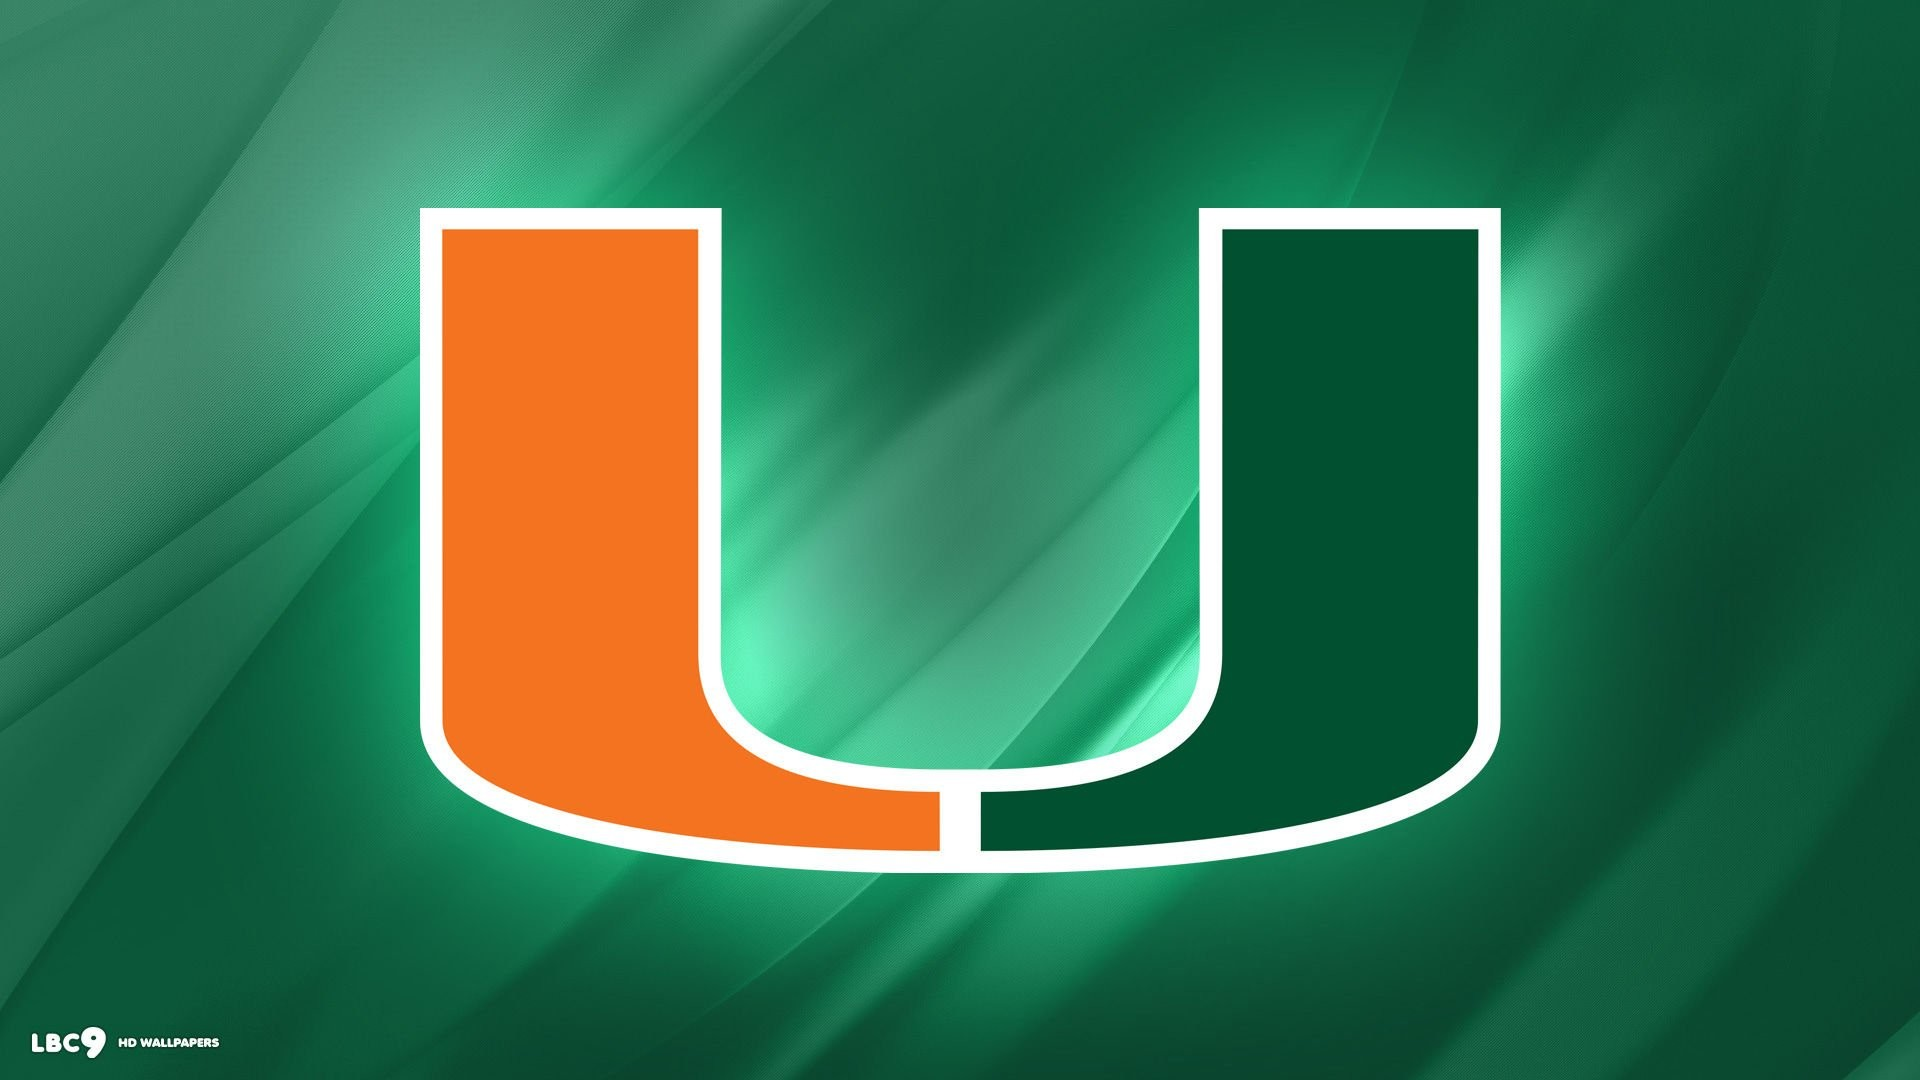 University of Miami Football Wallpaper – WallpaperSafari